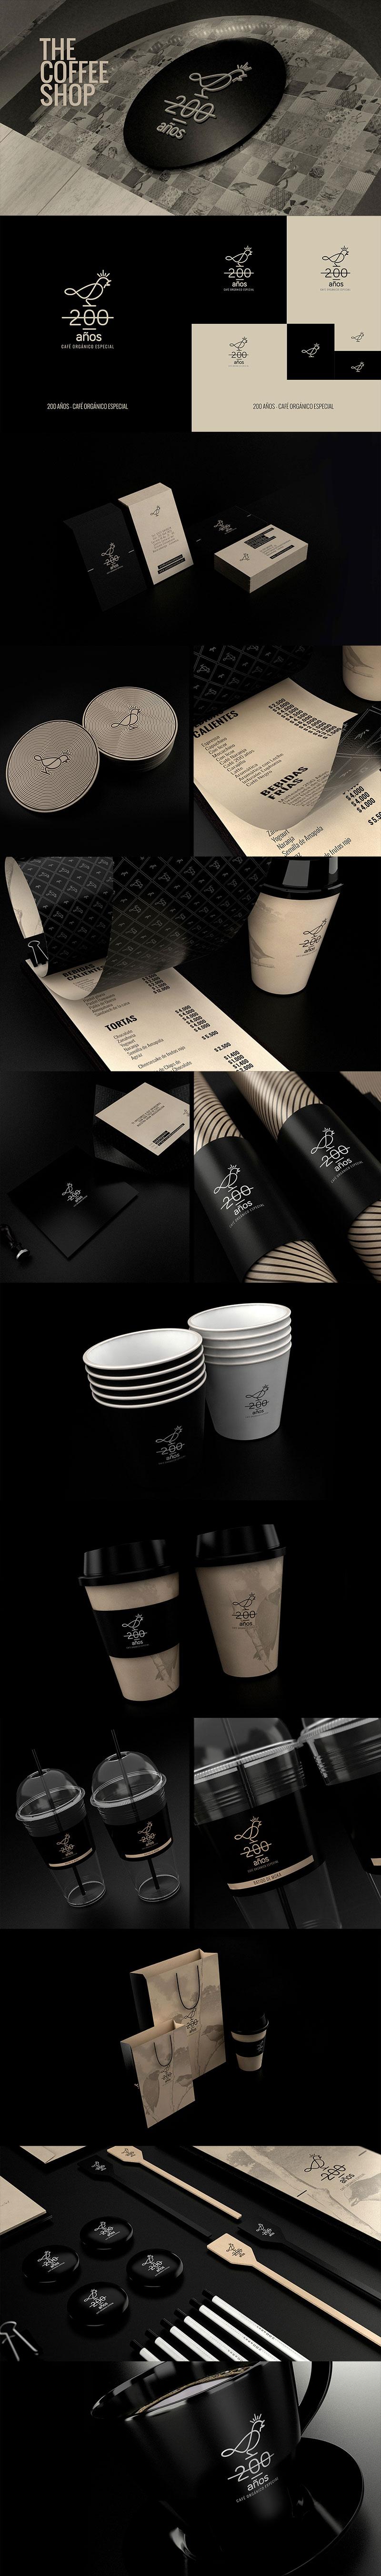 200 Years Coffee by David Espinosa IDS